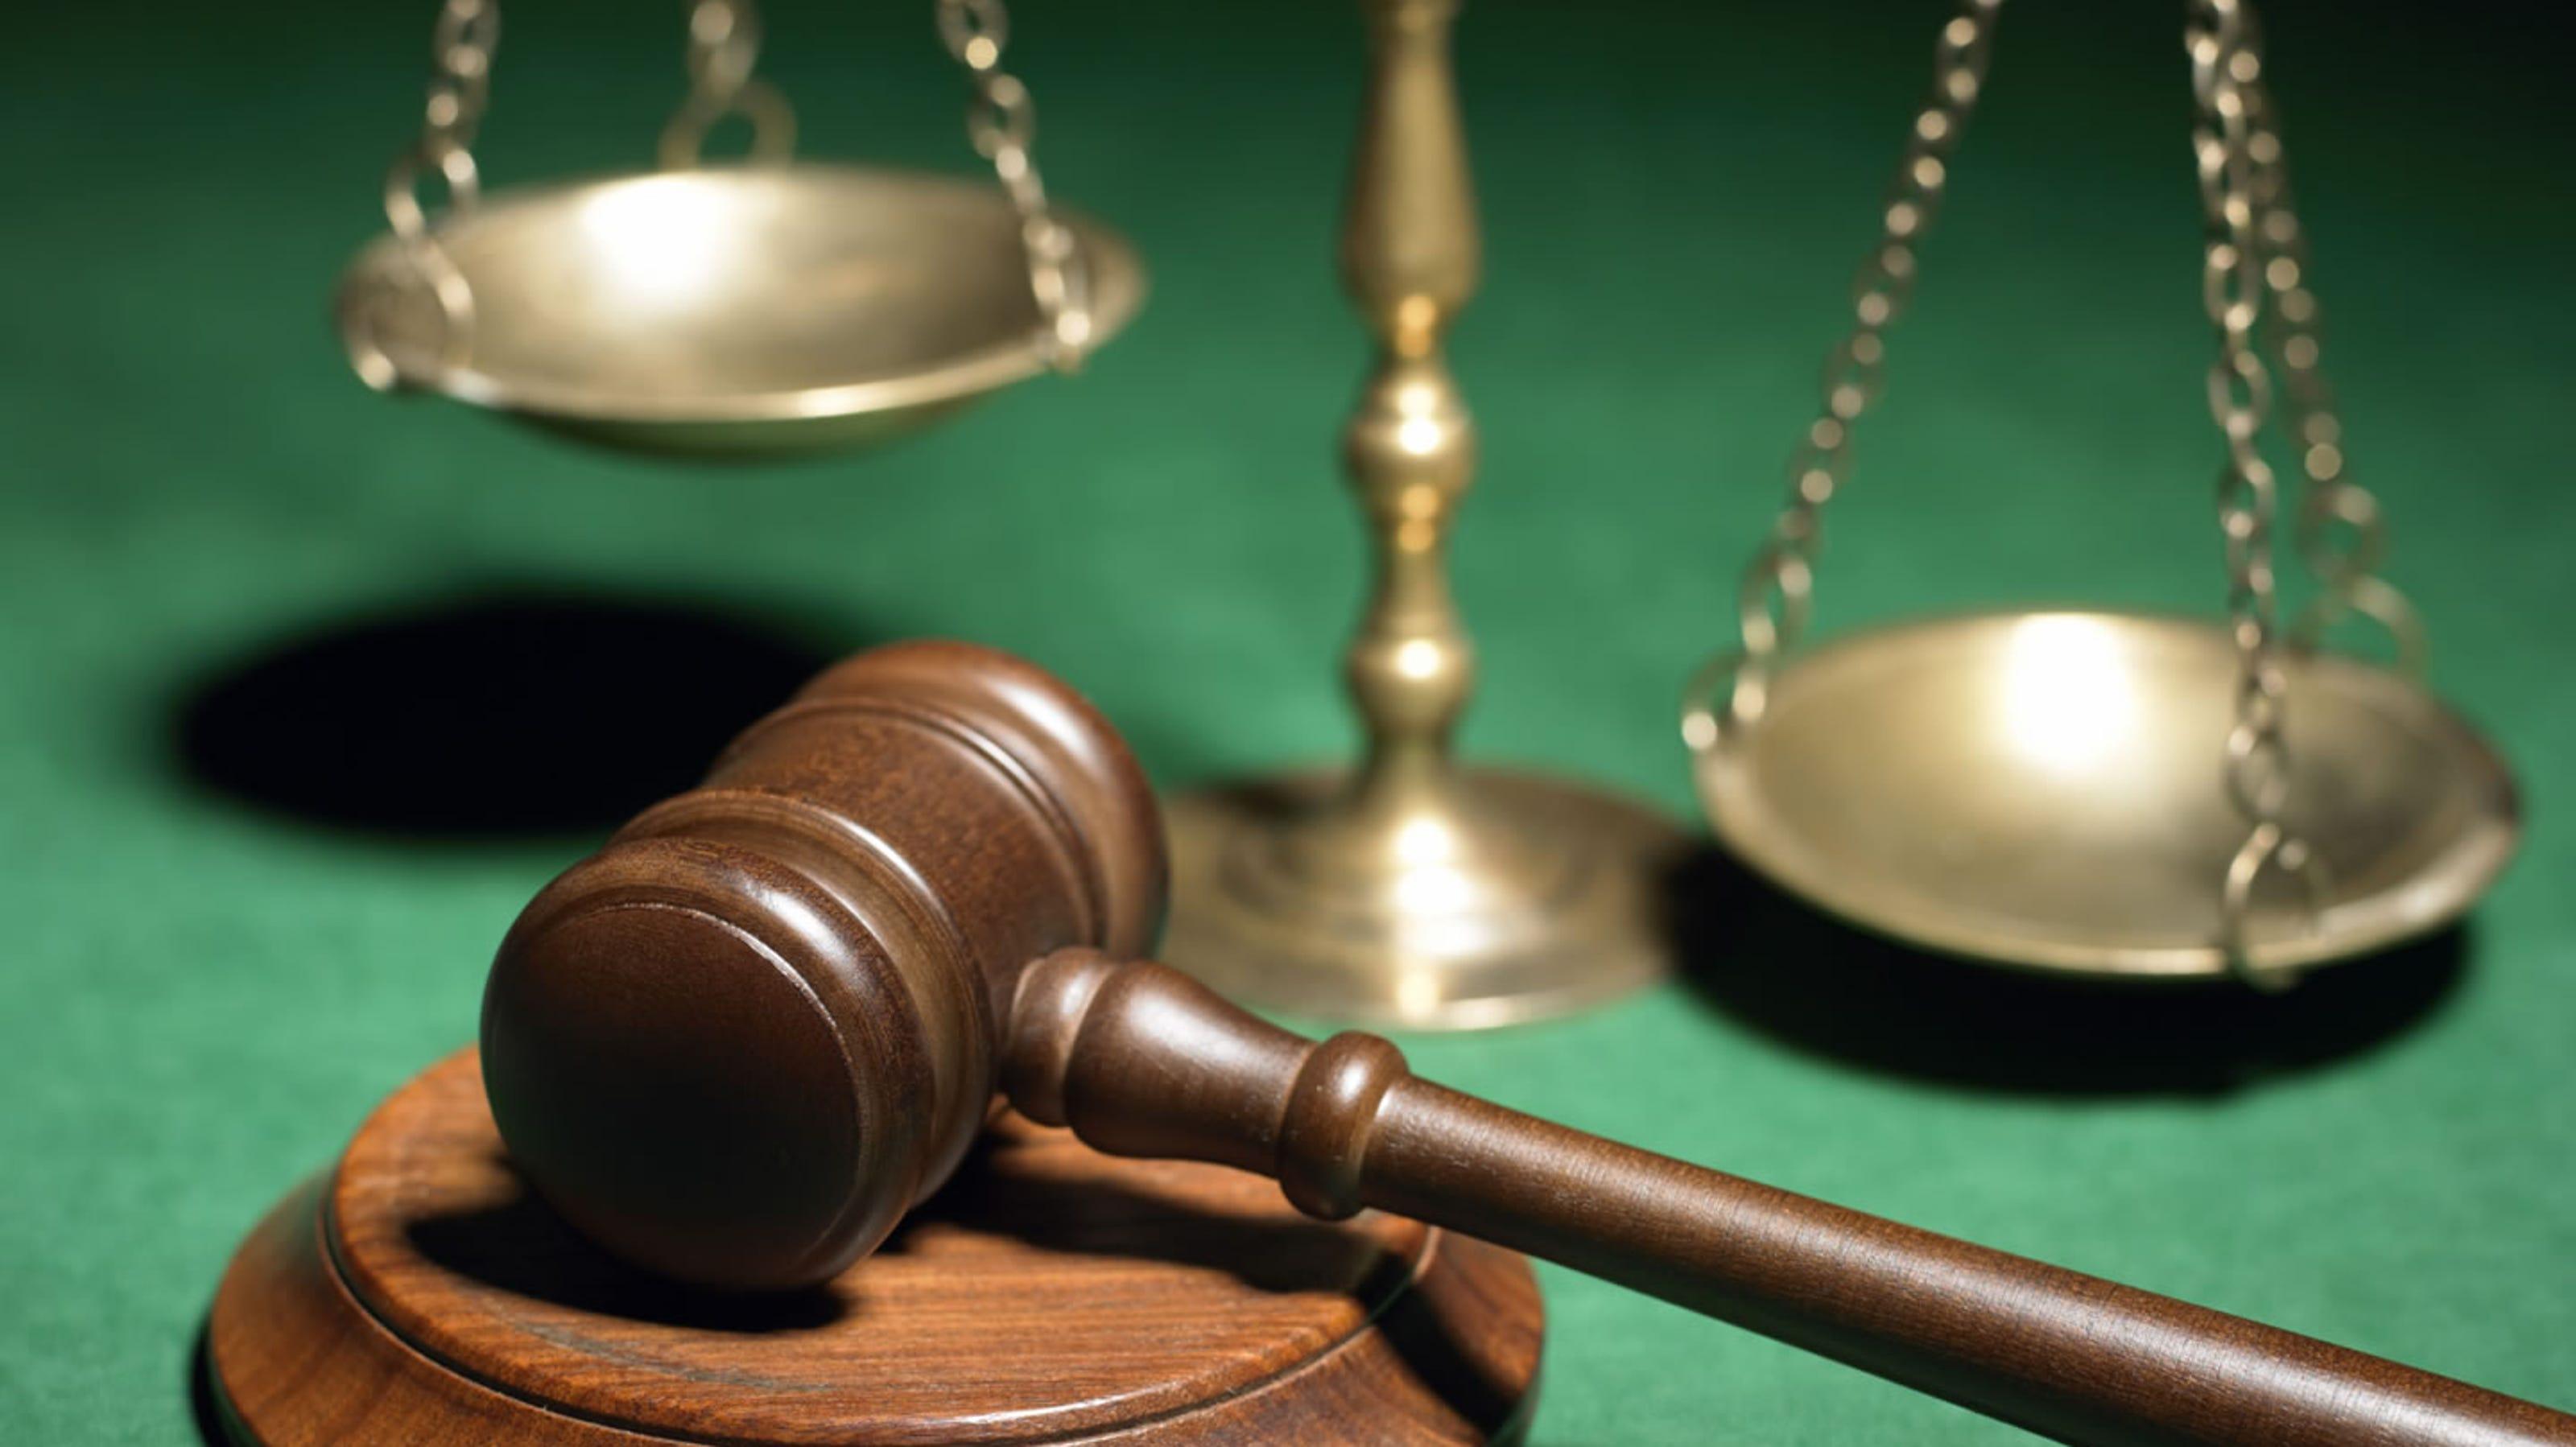 Jury finds excessive force in 2013 Des Moines police arrest